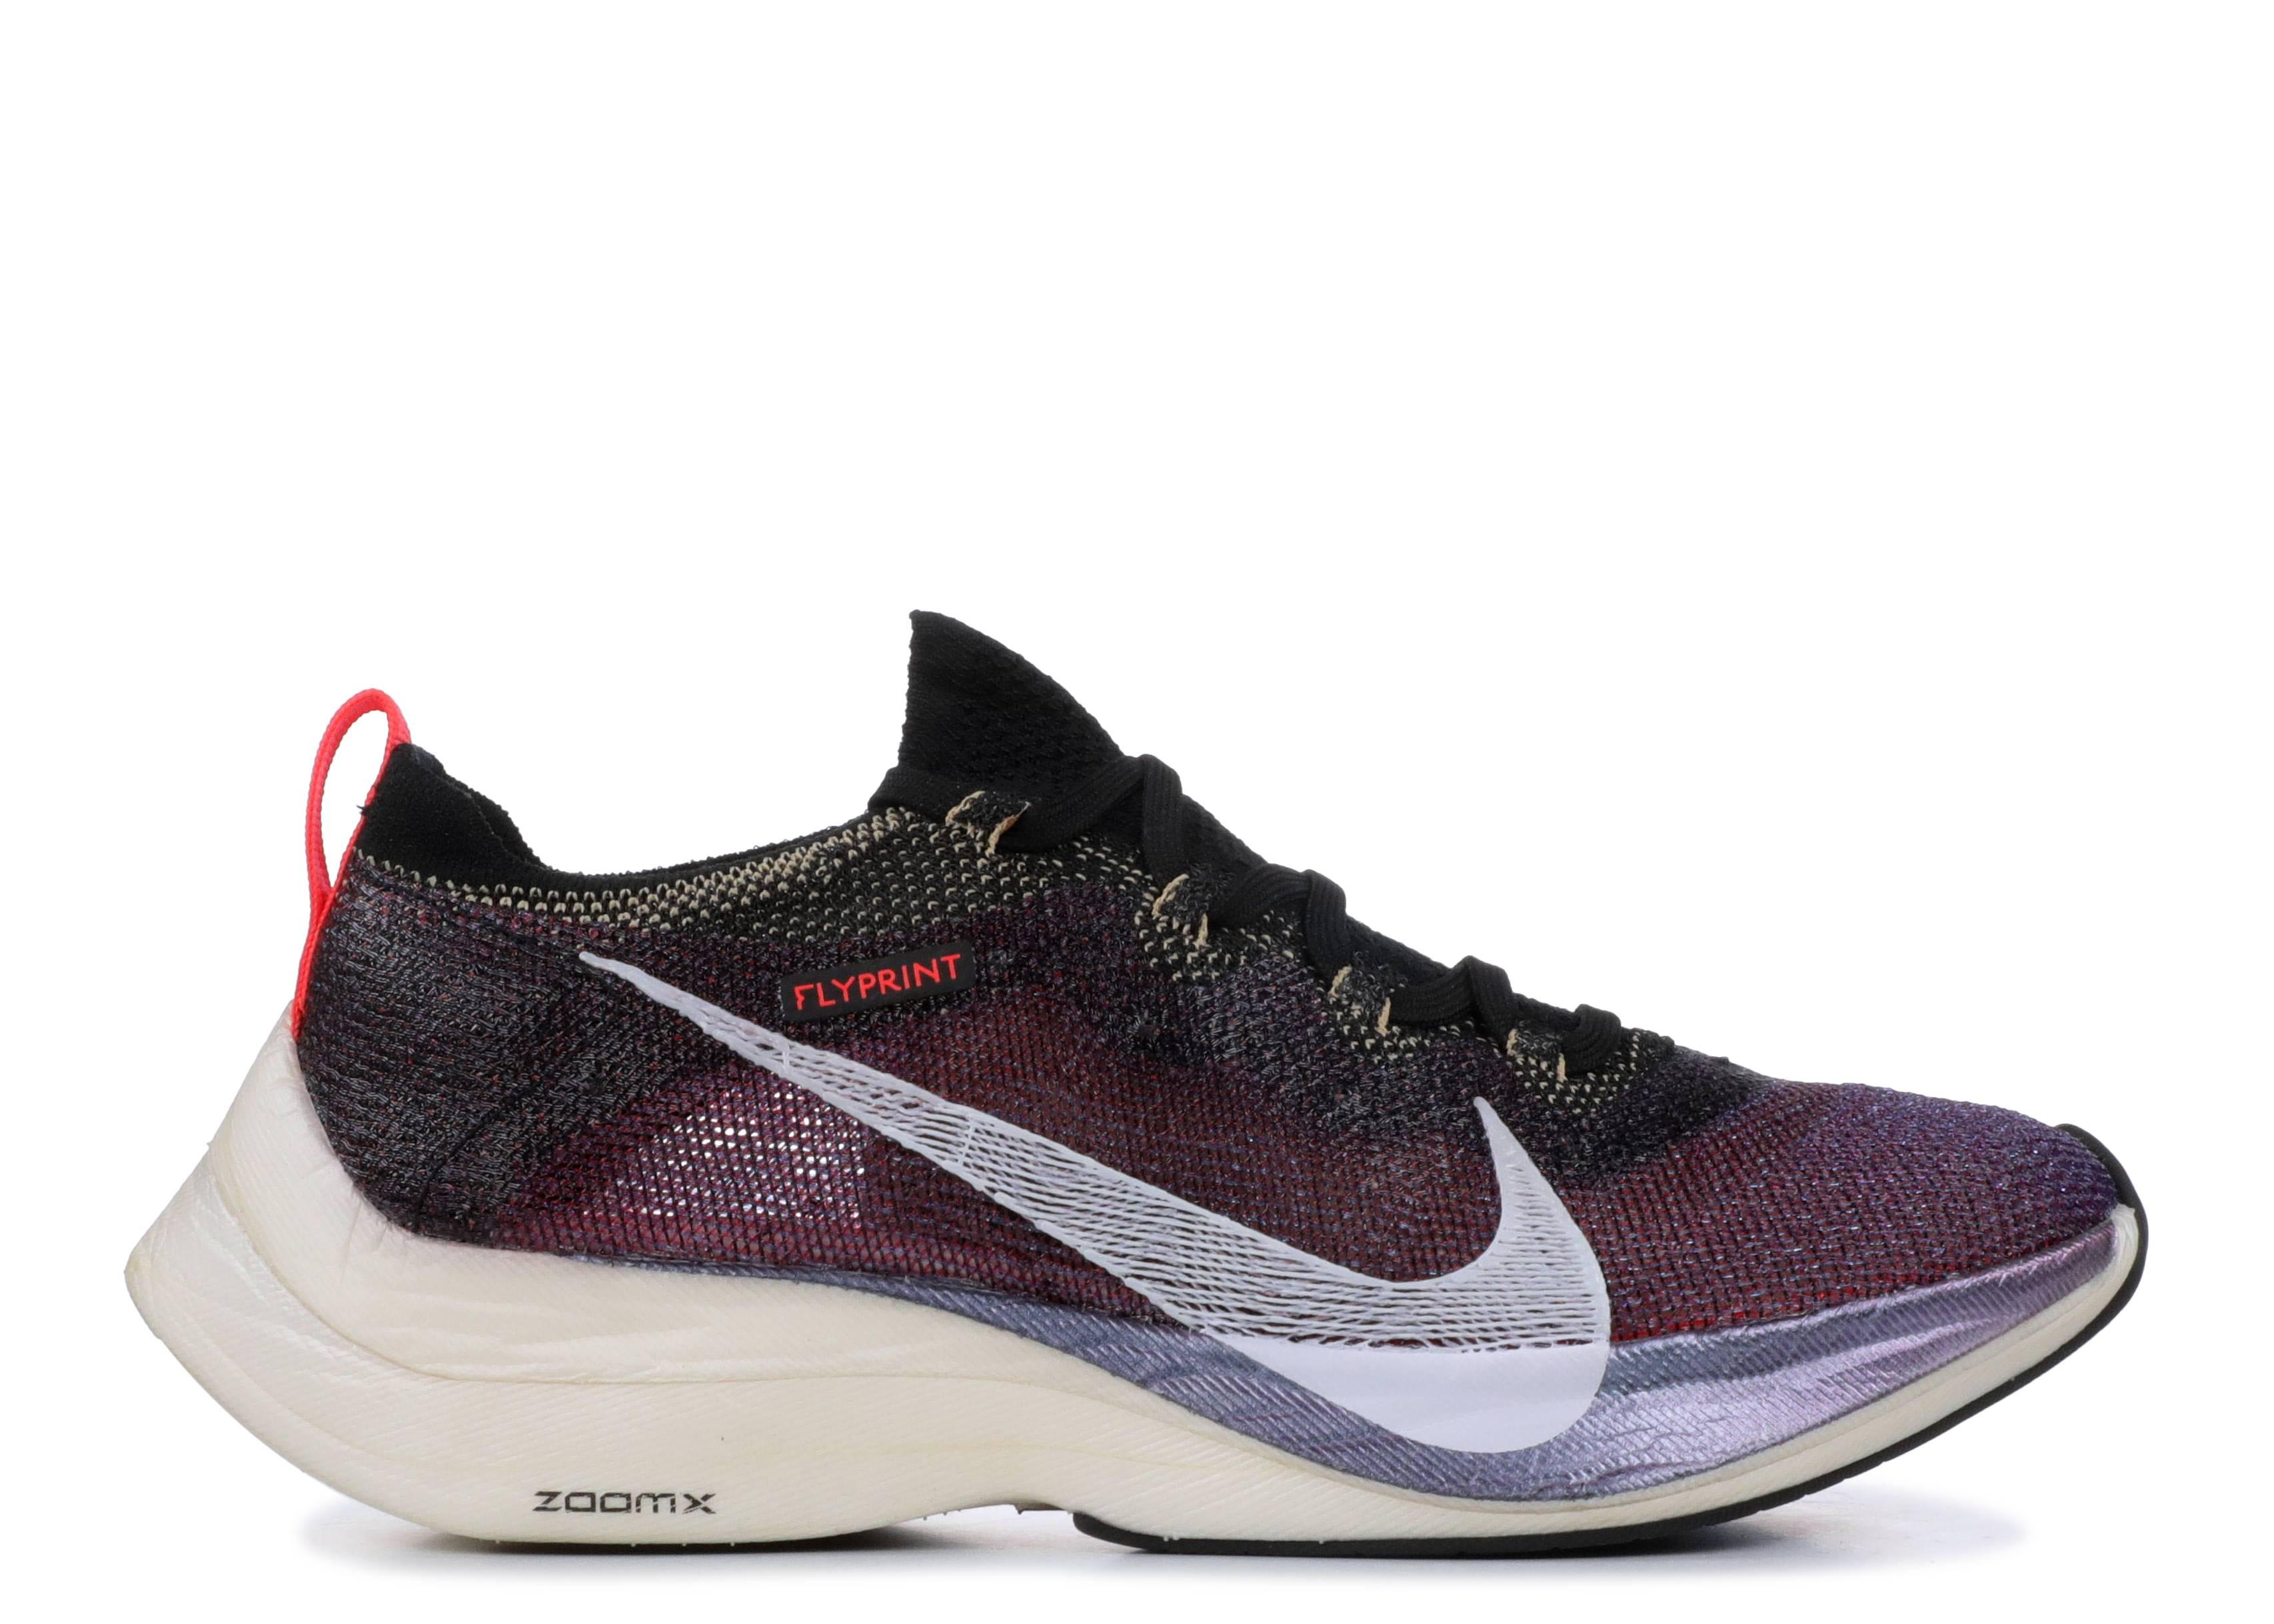 6a1272a8733f4 Nike Zoom Vaporfly Elite Flyprint